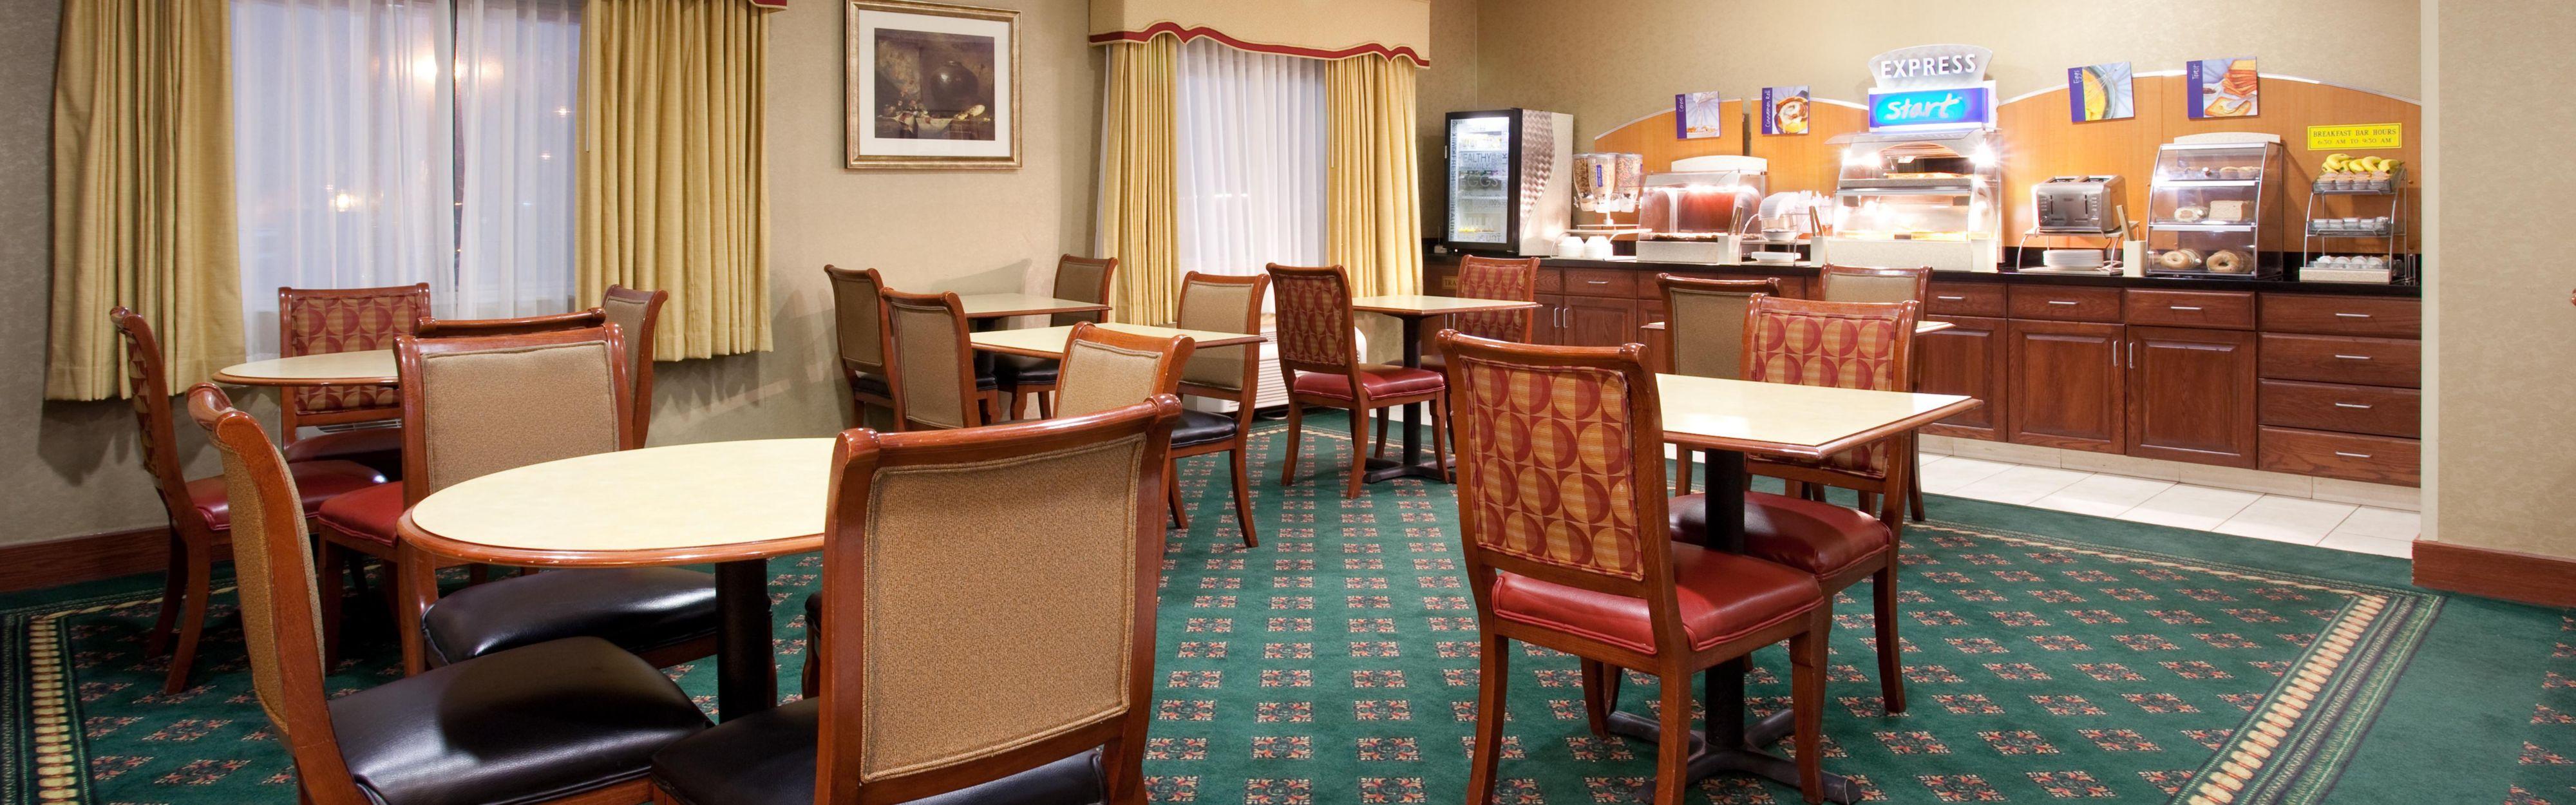 Holiday Inn Express Greeley image 3